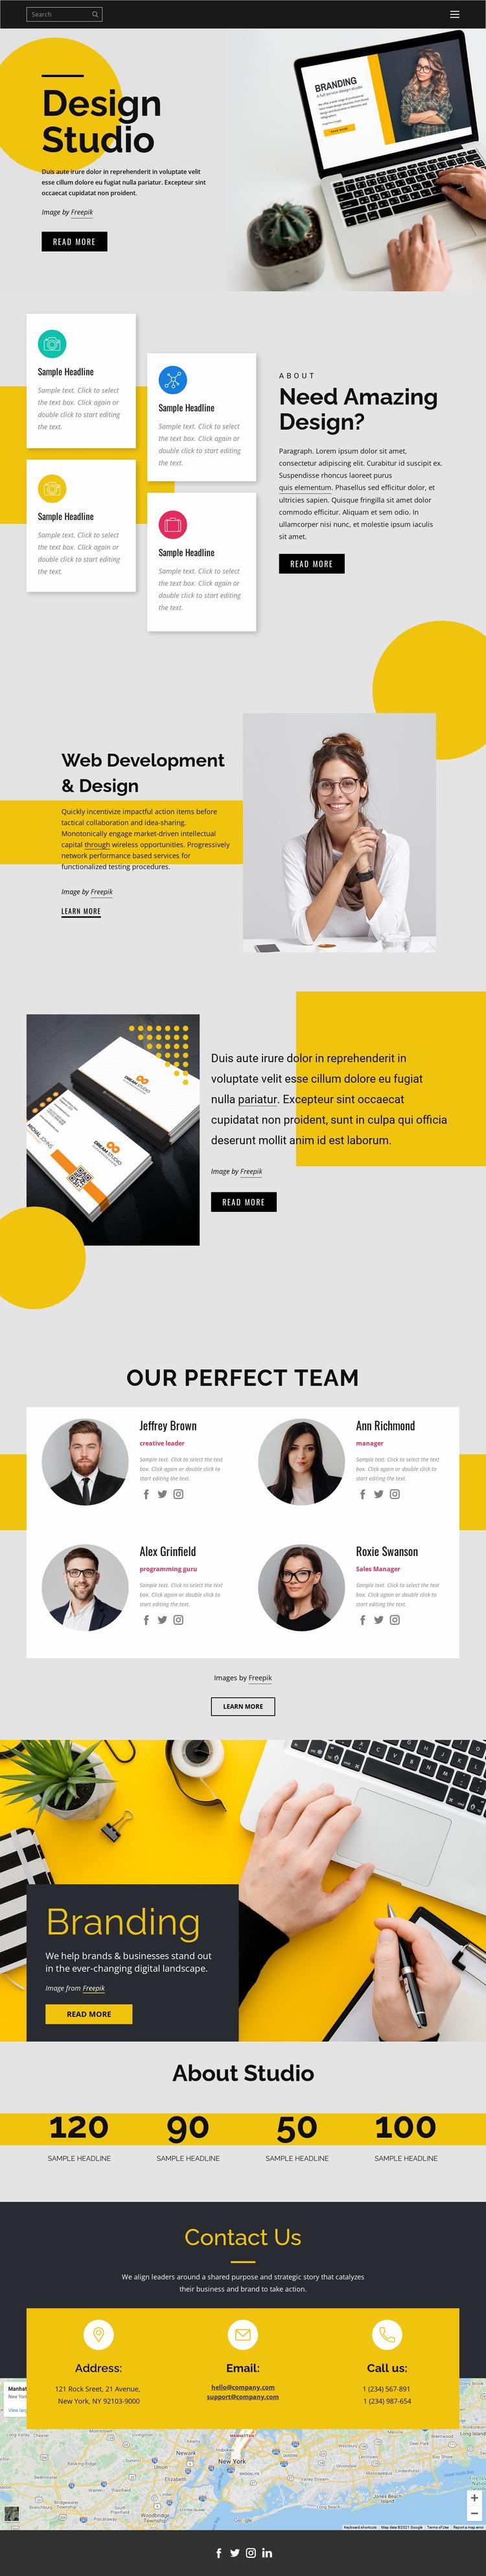 Brand, print & web design Html Website Builder